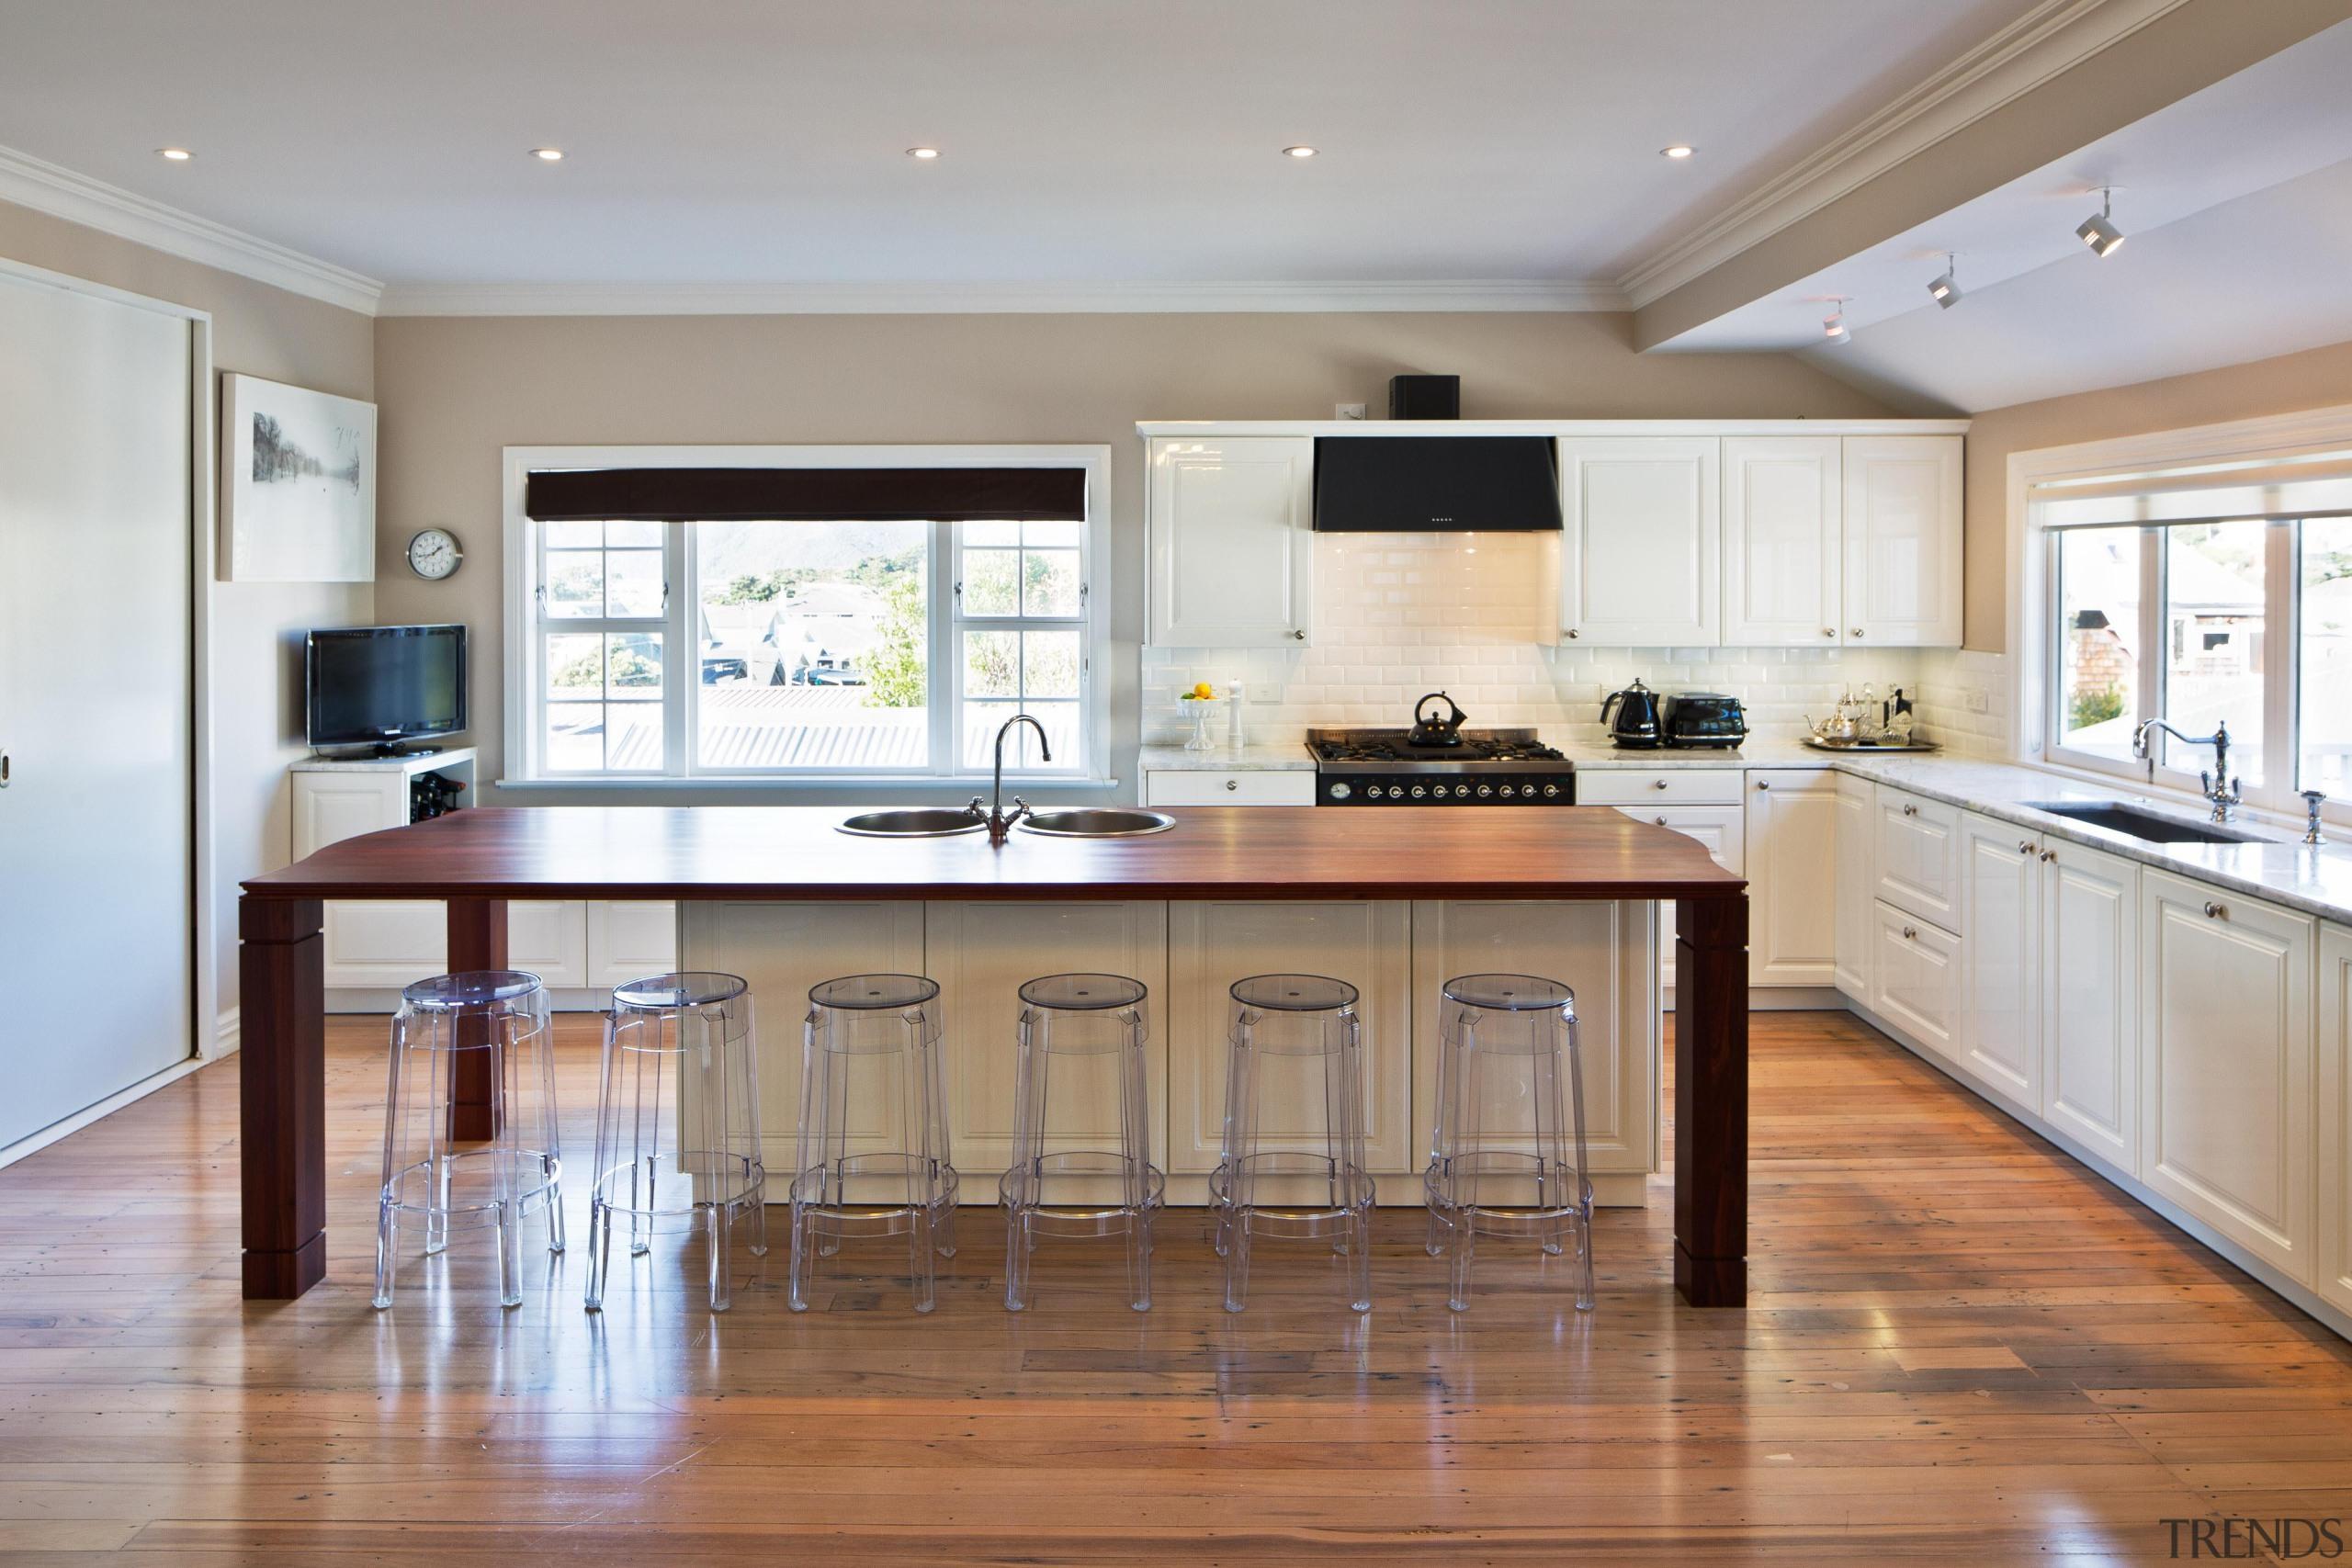 burnham14.jpg - burnham14.jpg - cabinetry | countertop | cabinetry, countertop, cuisine classique, floor, flooring, hardwood, interior design, kitchen, laminate flooring, real estate, room, wood flooring, gray